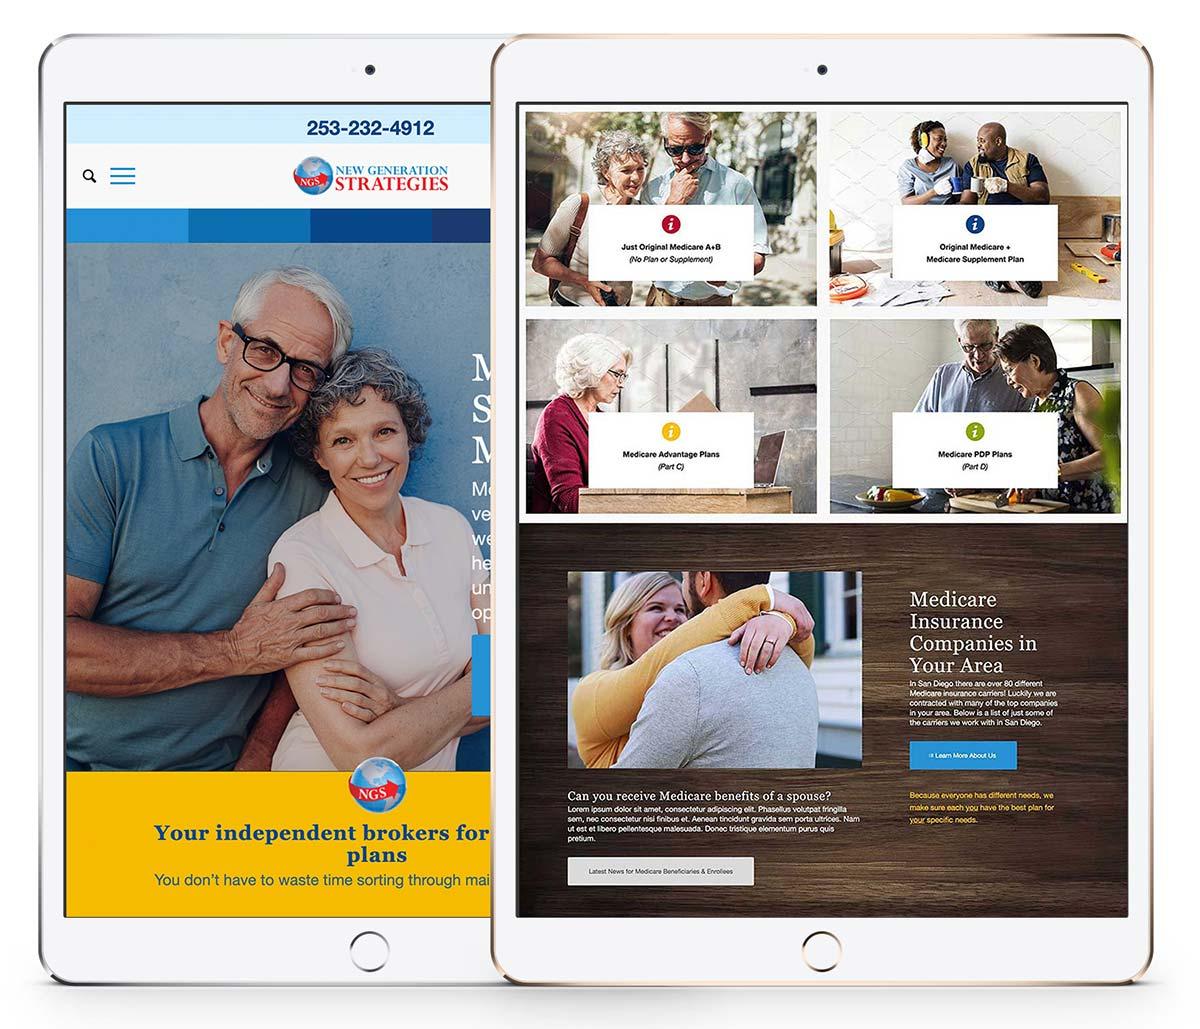 New Generation Strategies website on an iPad